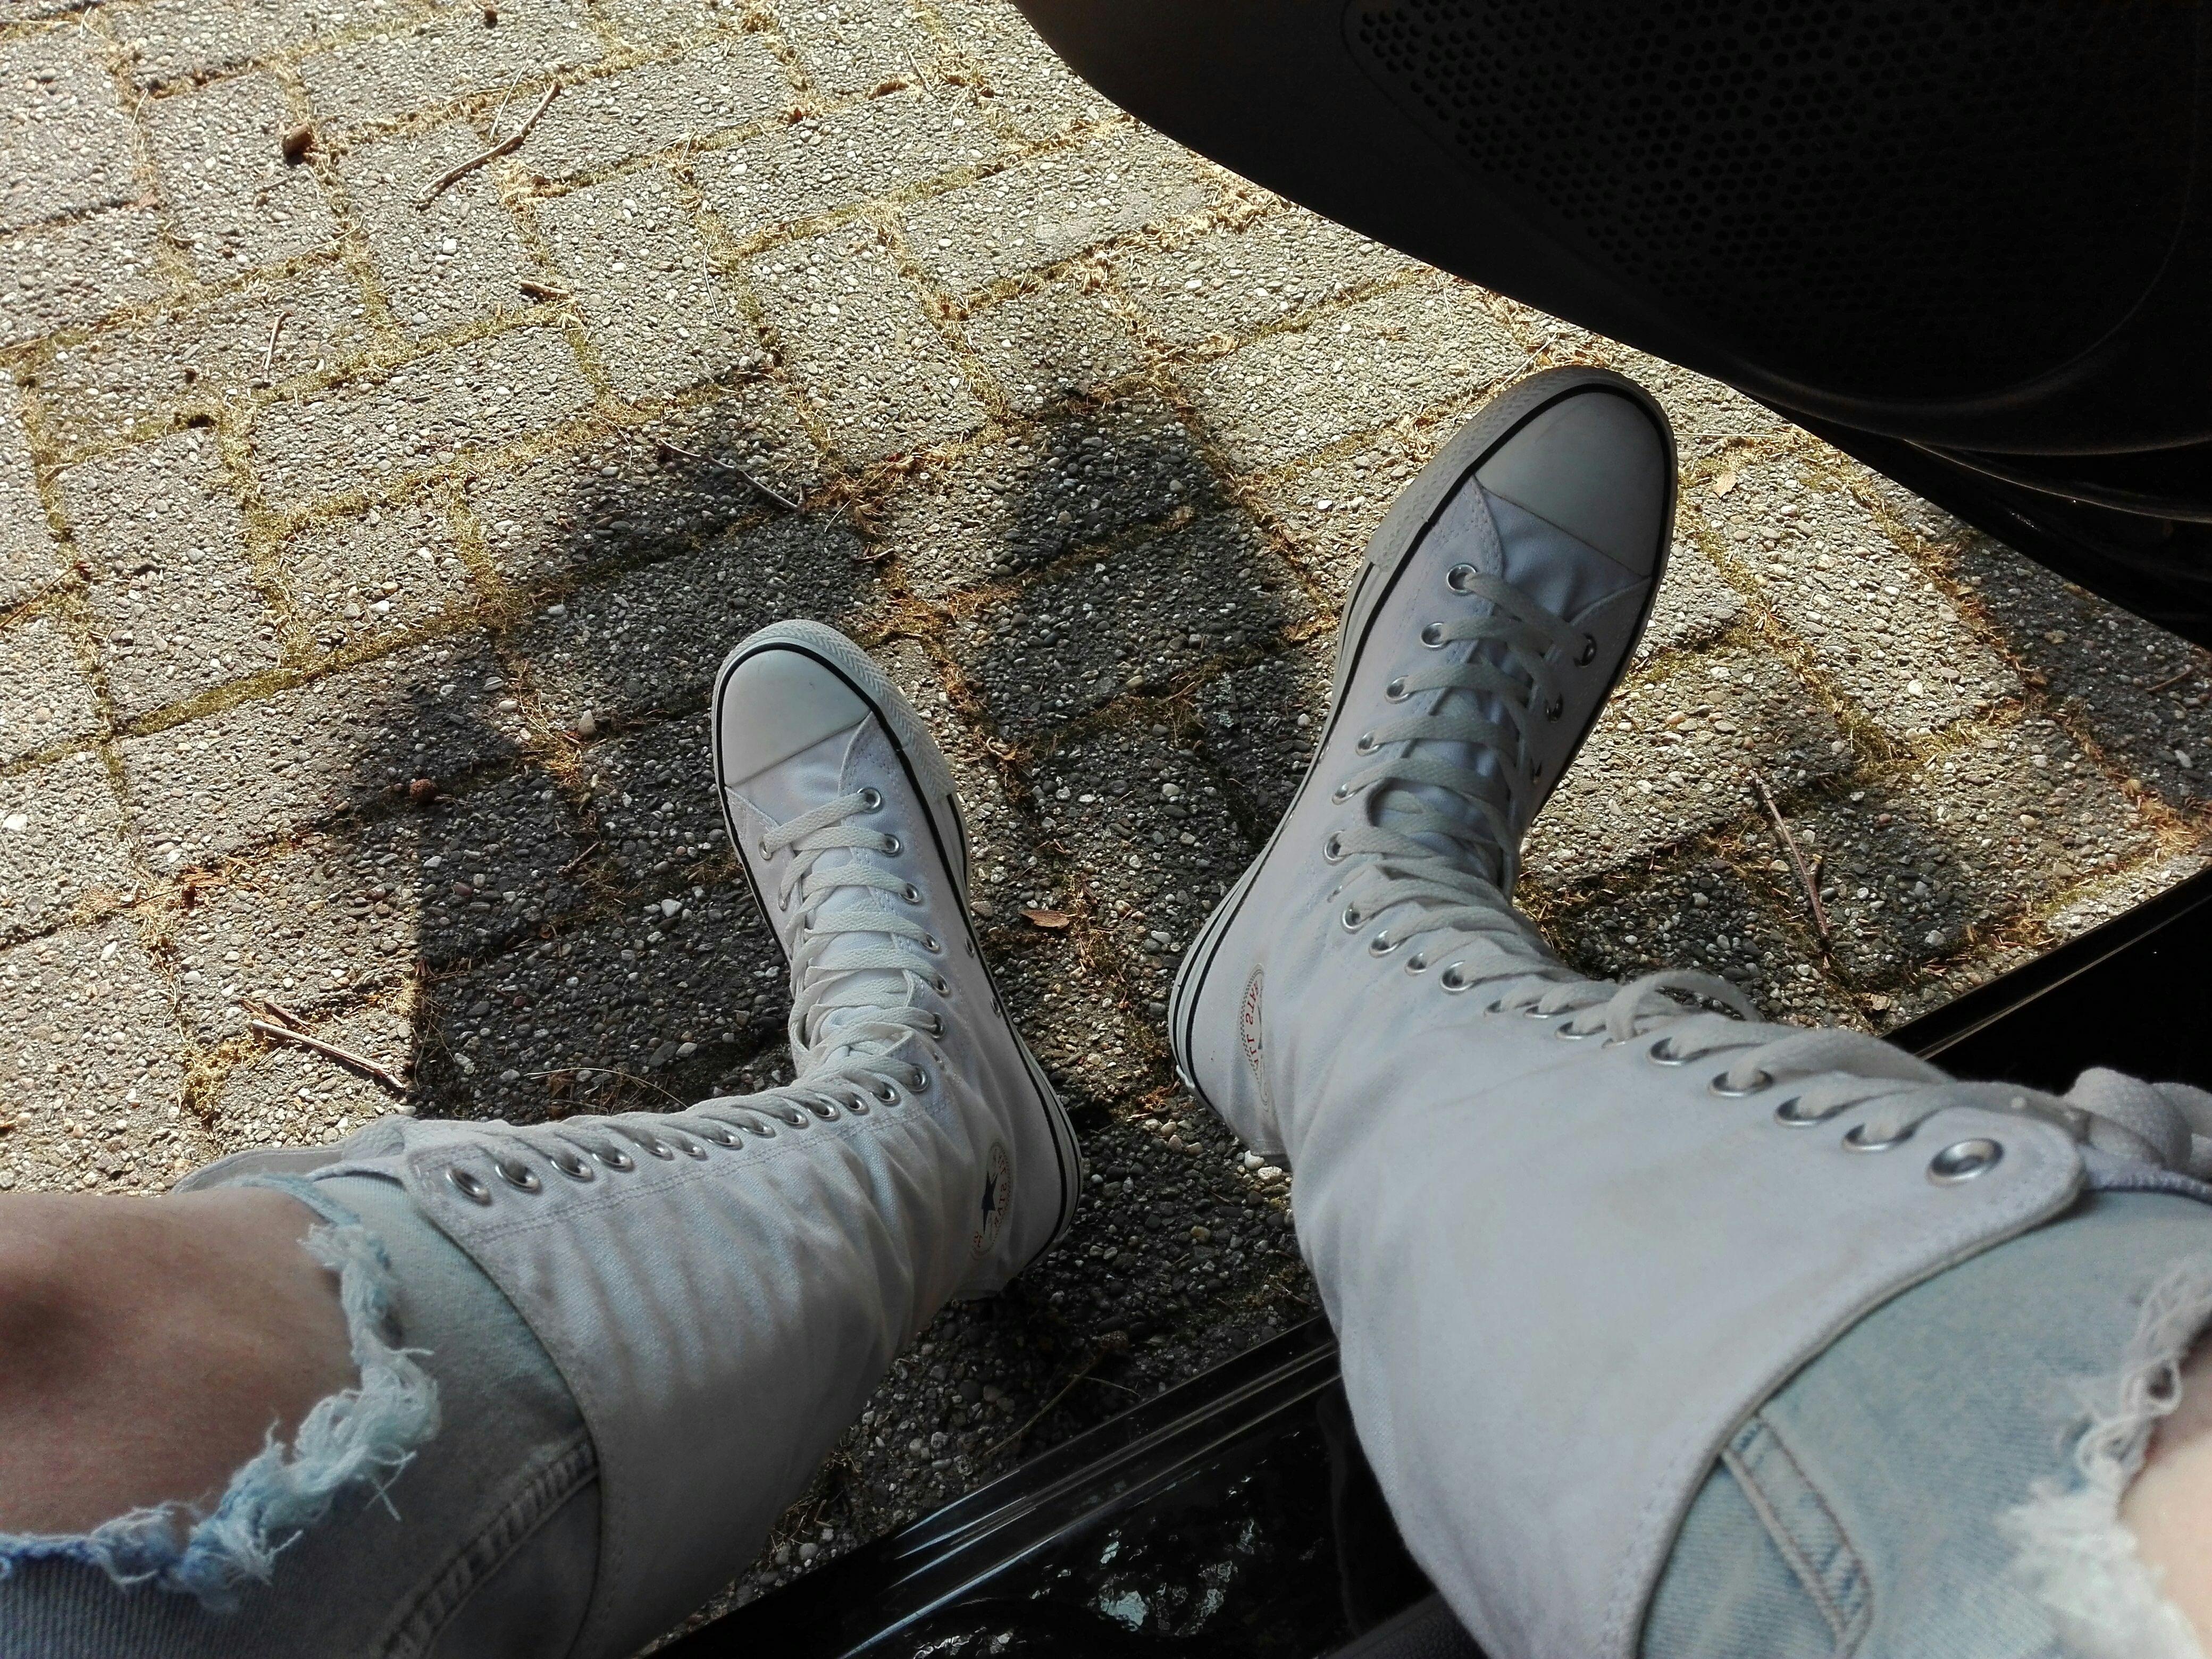 Converse xxhi | Chucks converse, Knee high converse, Boots